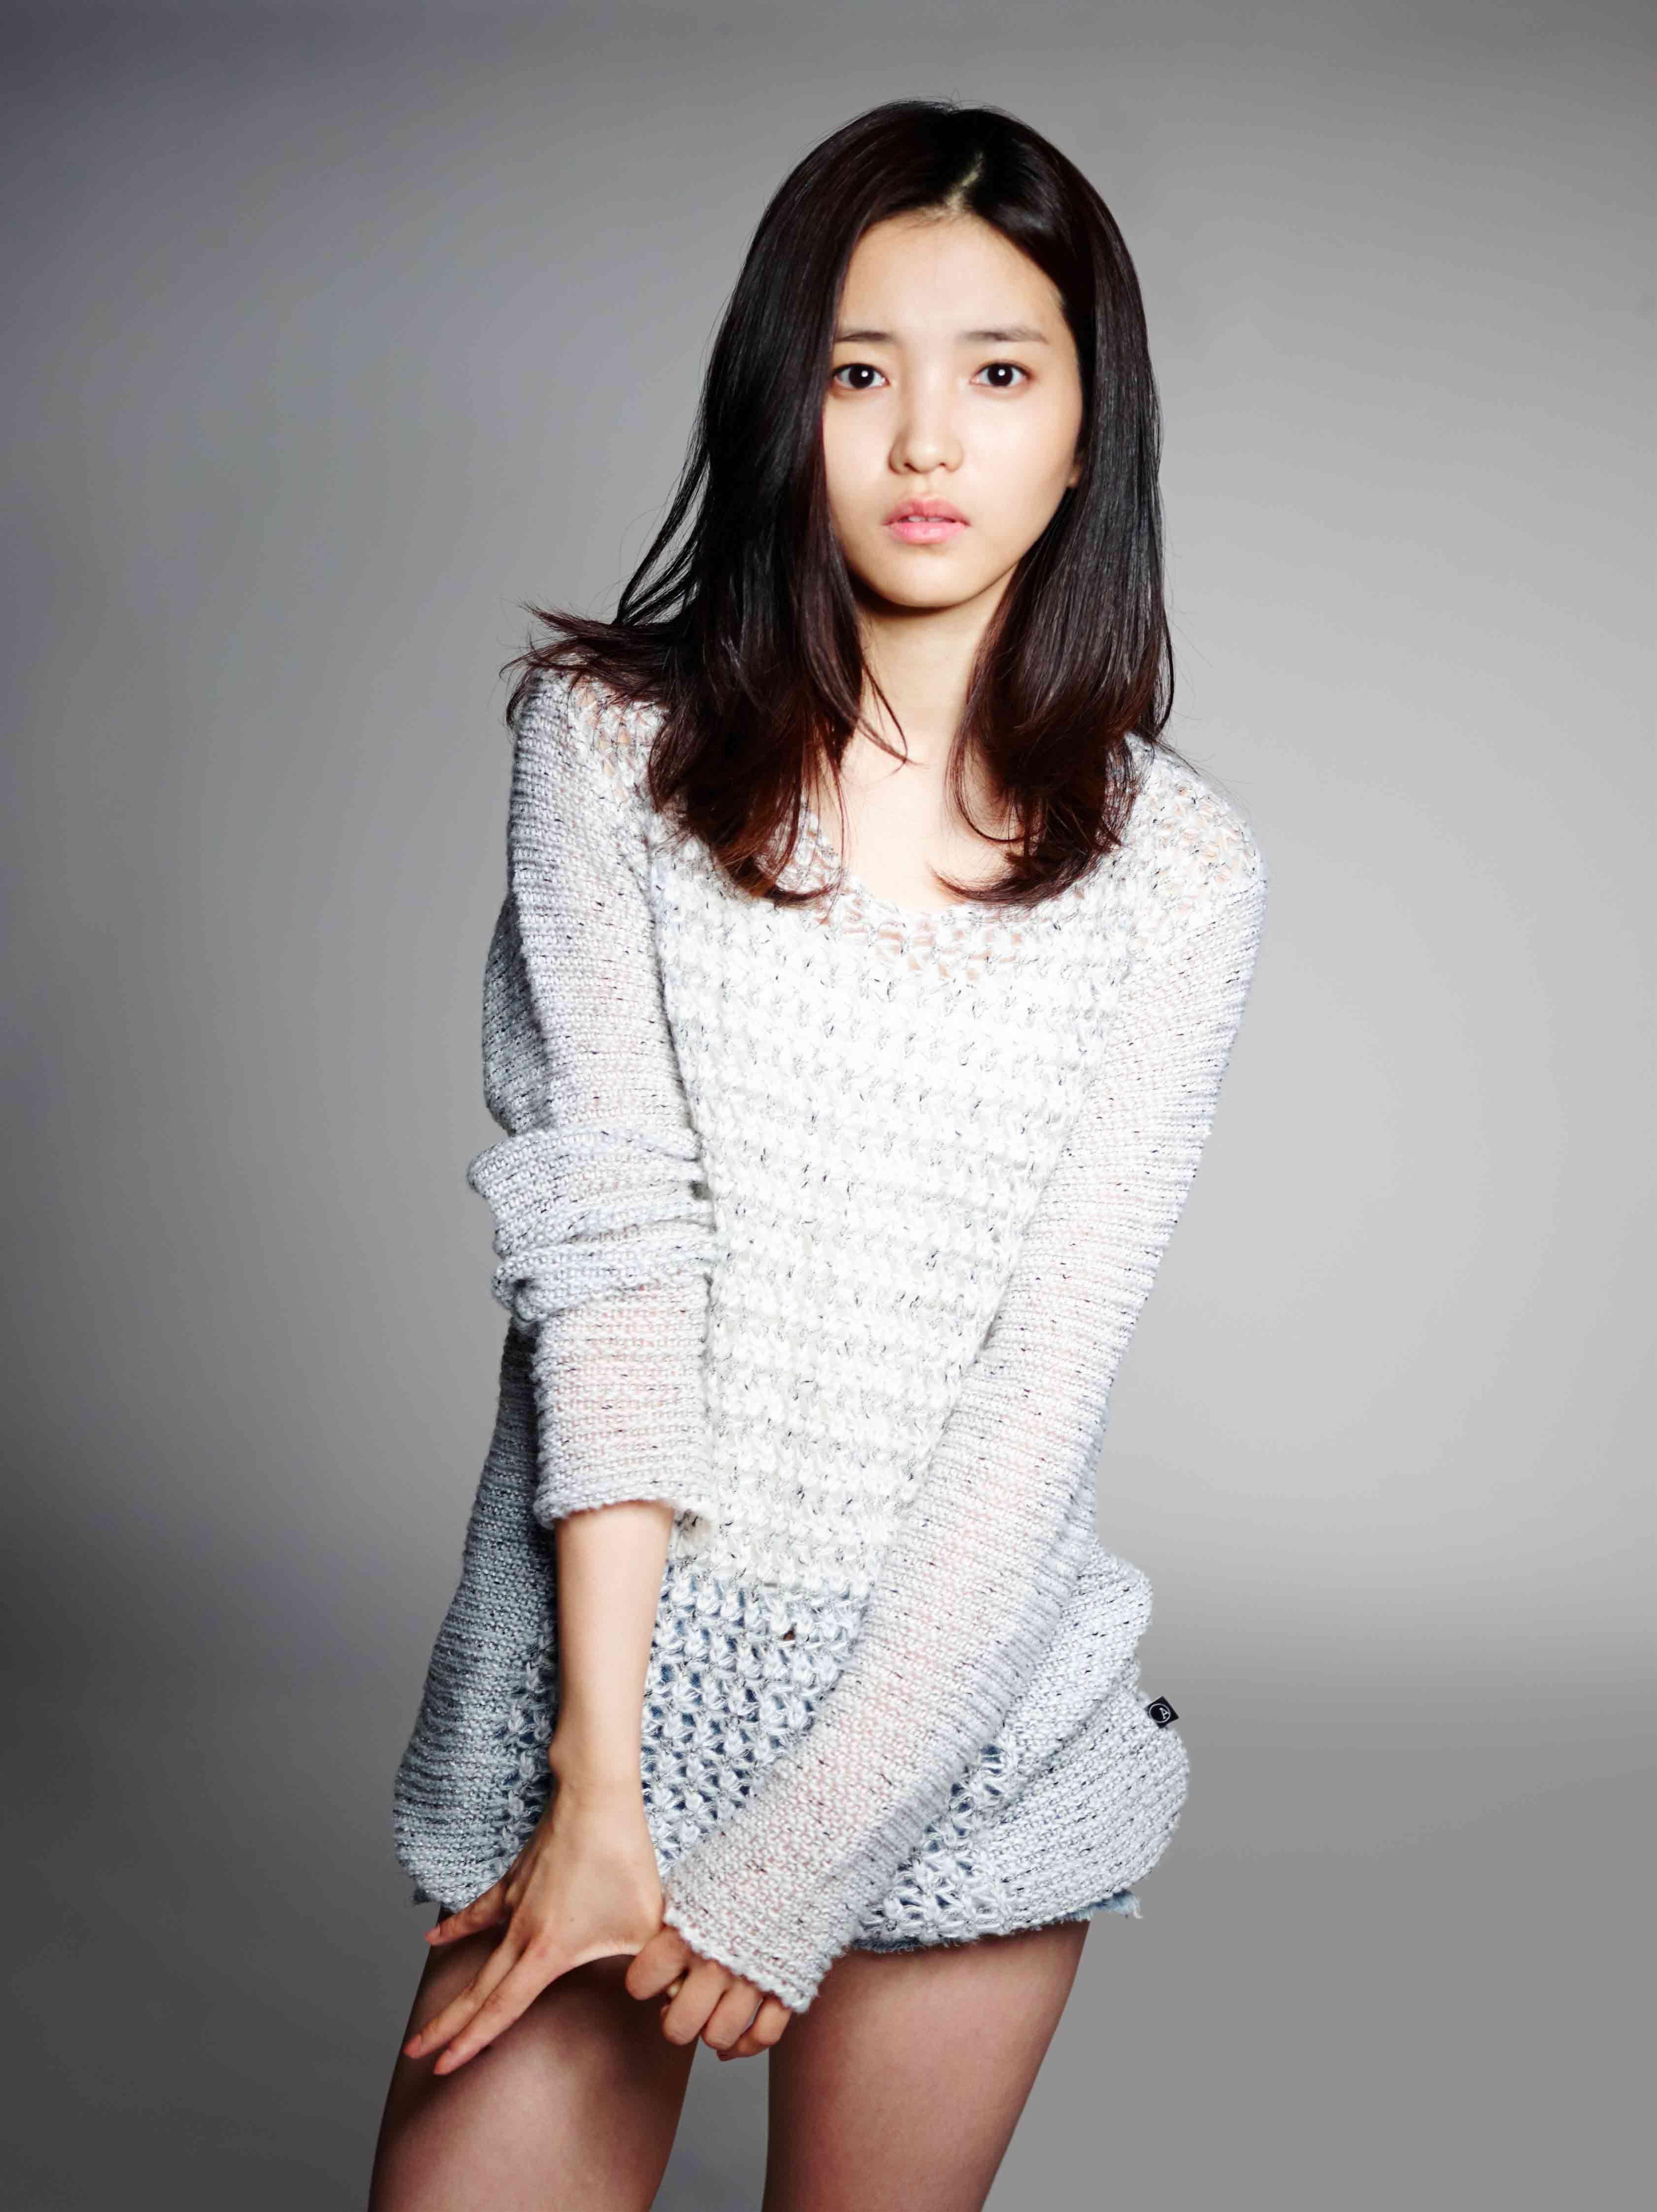 Kim Tae-ri - 김태리 | 배우, 여성 얼굴, 아름다운 여성